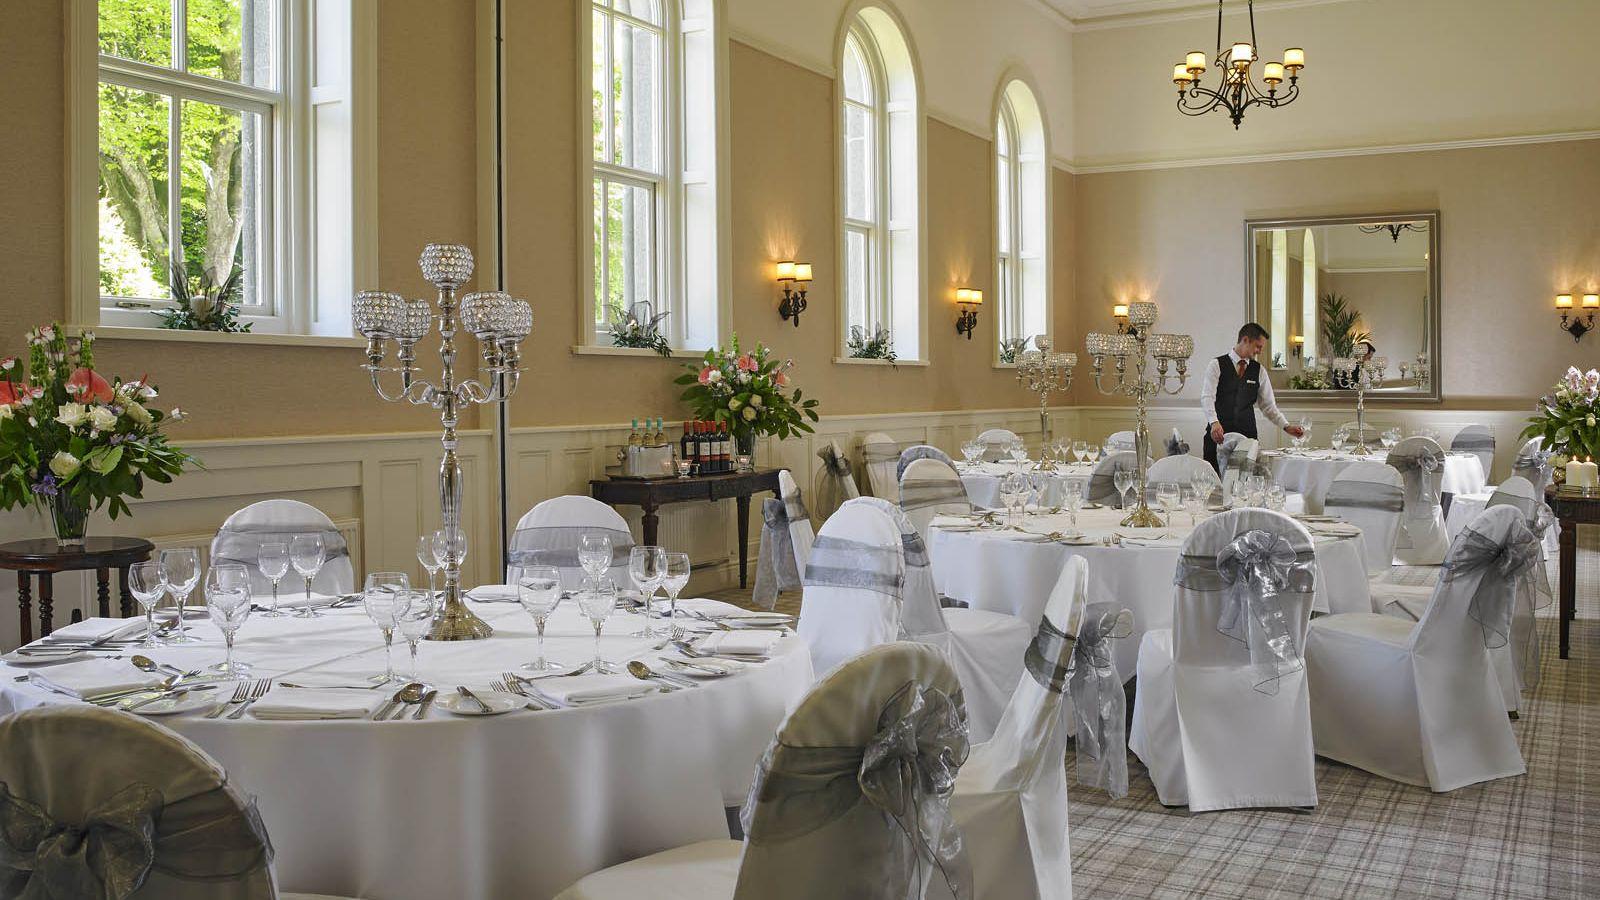 Luxury Wedding Venues Wedding Venues Ireland Fbd Hotels Resorts